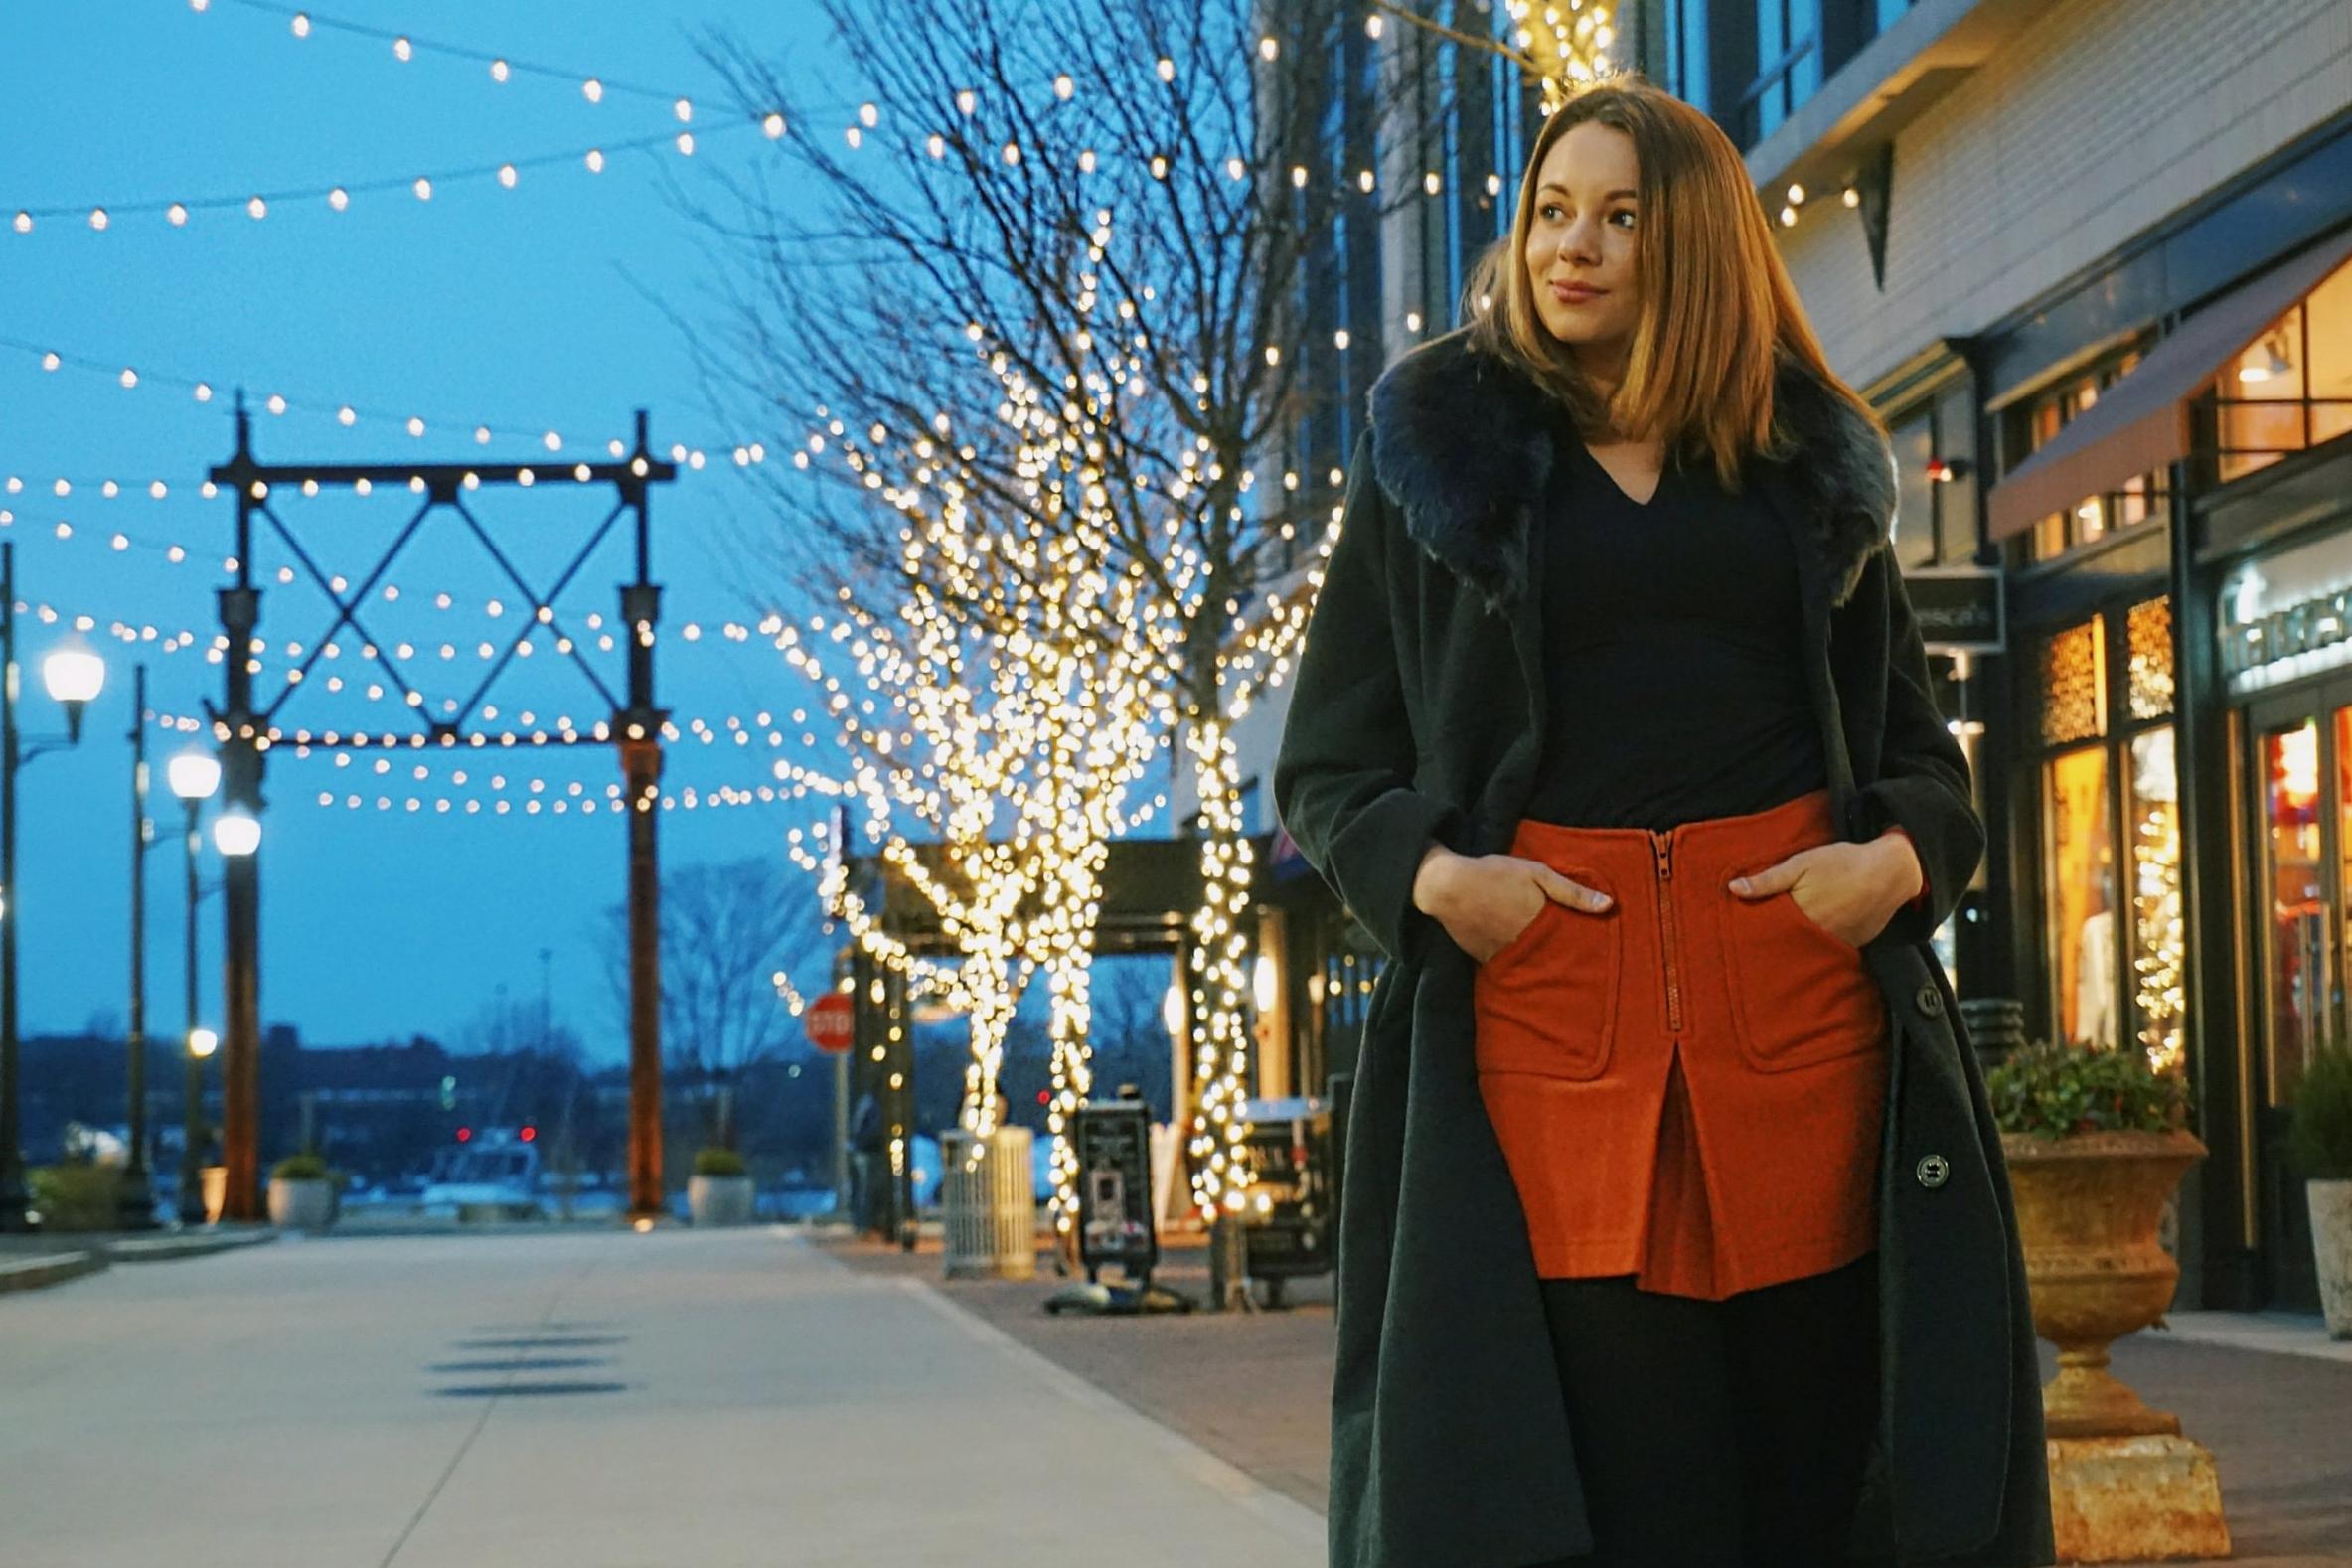 A blogger standing near Christmas lights, wearing a gray coat, orange skirt, black top.